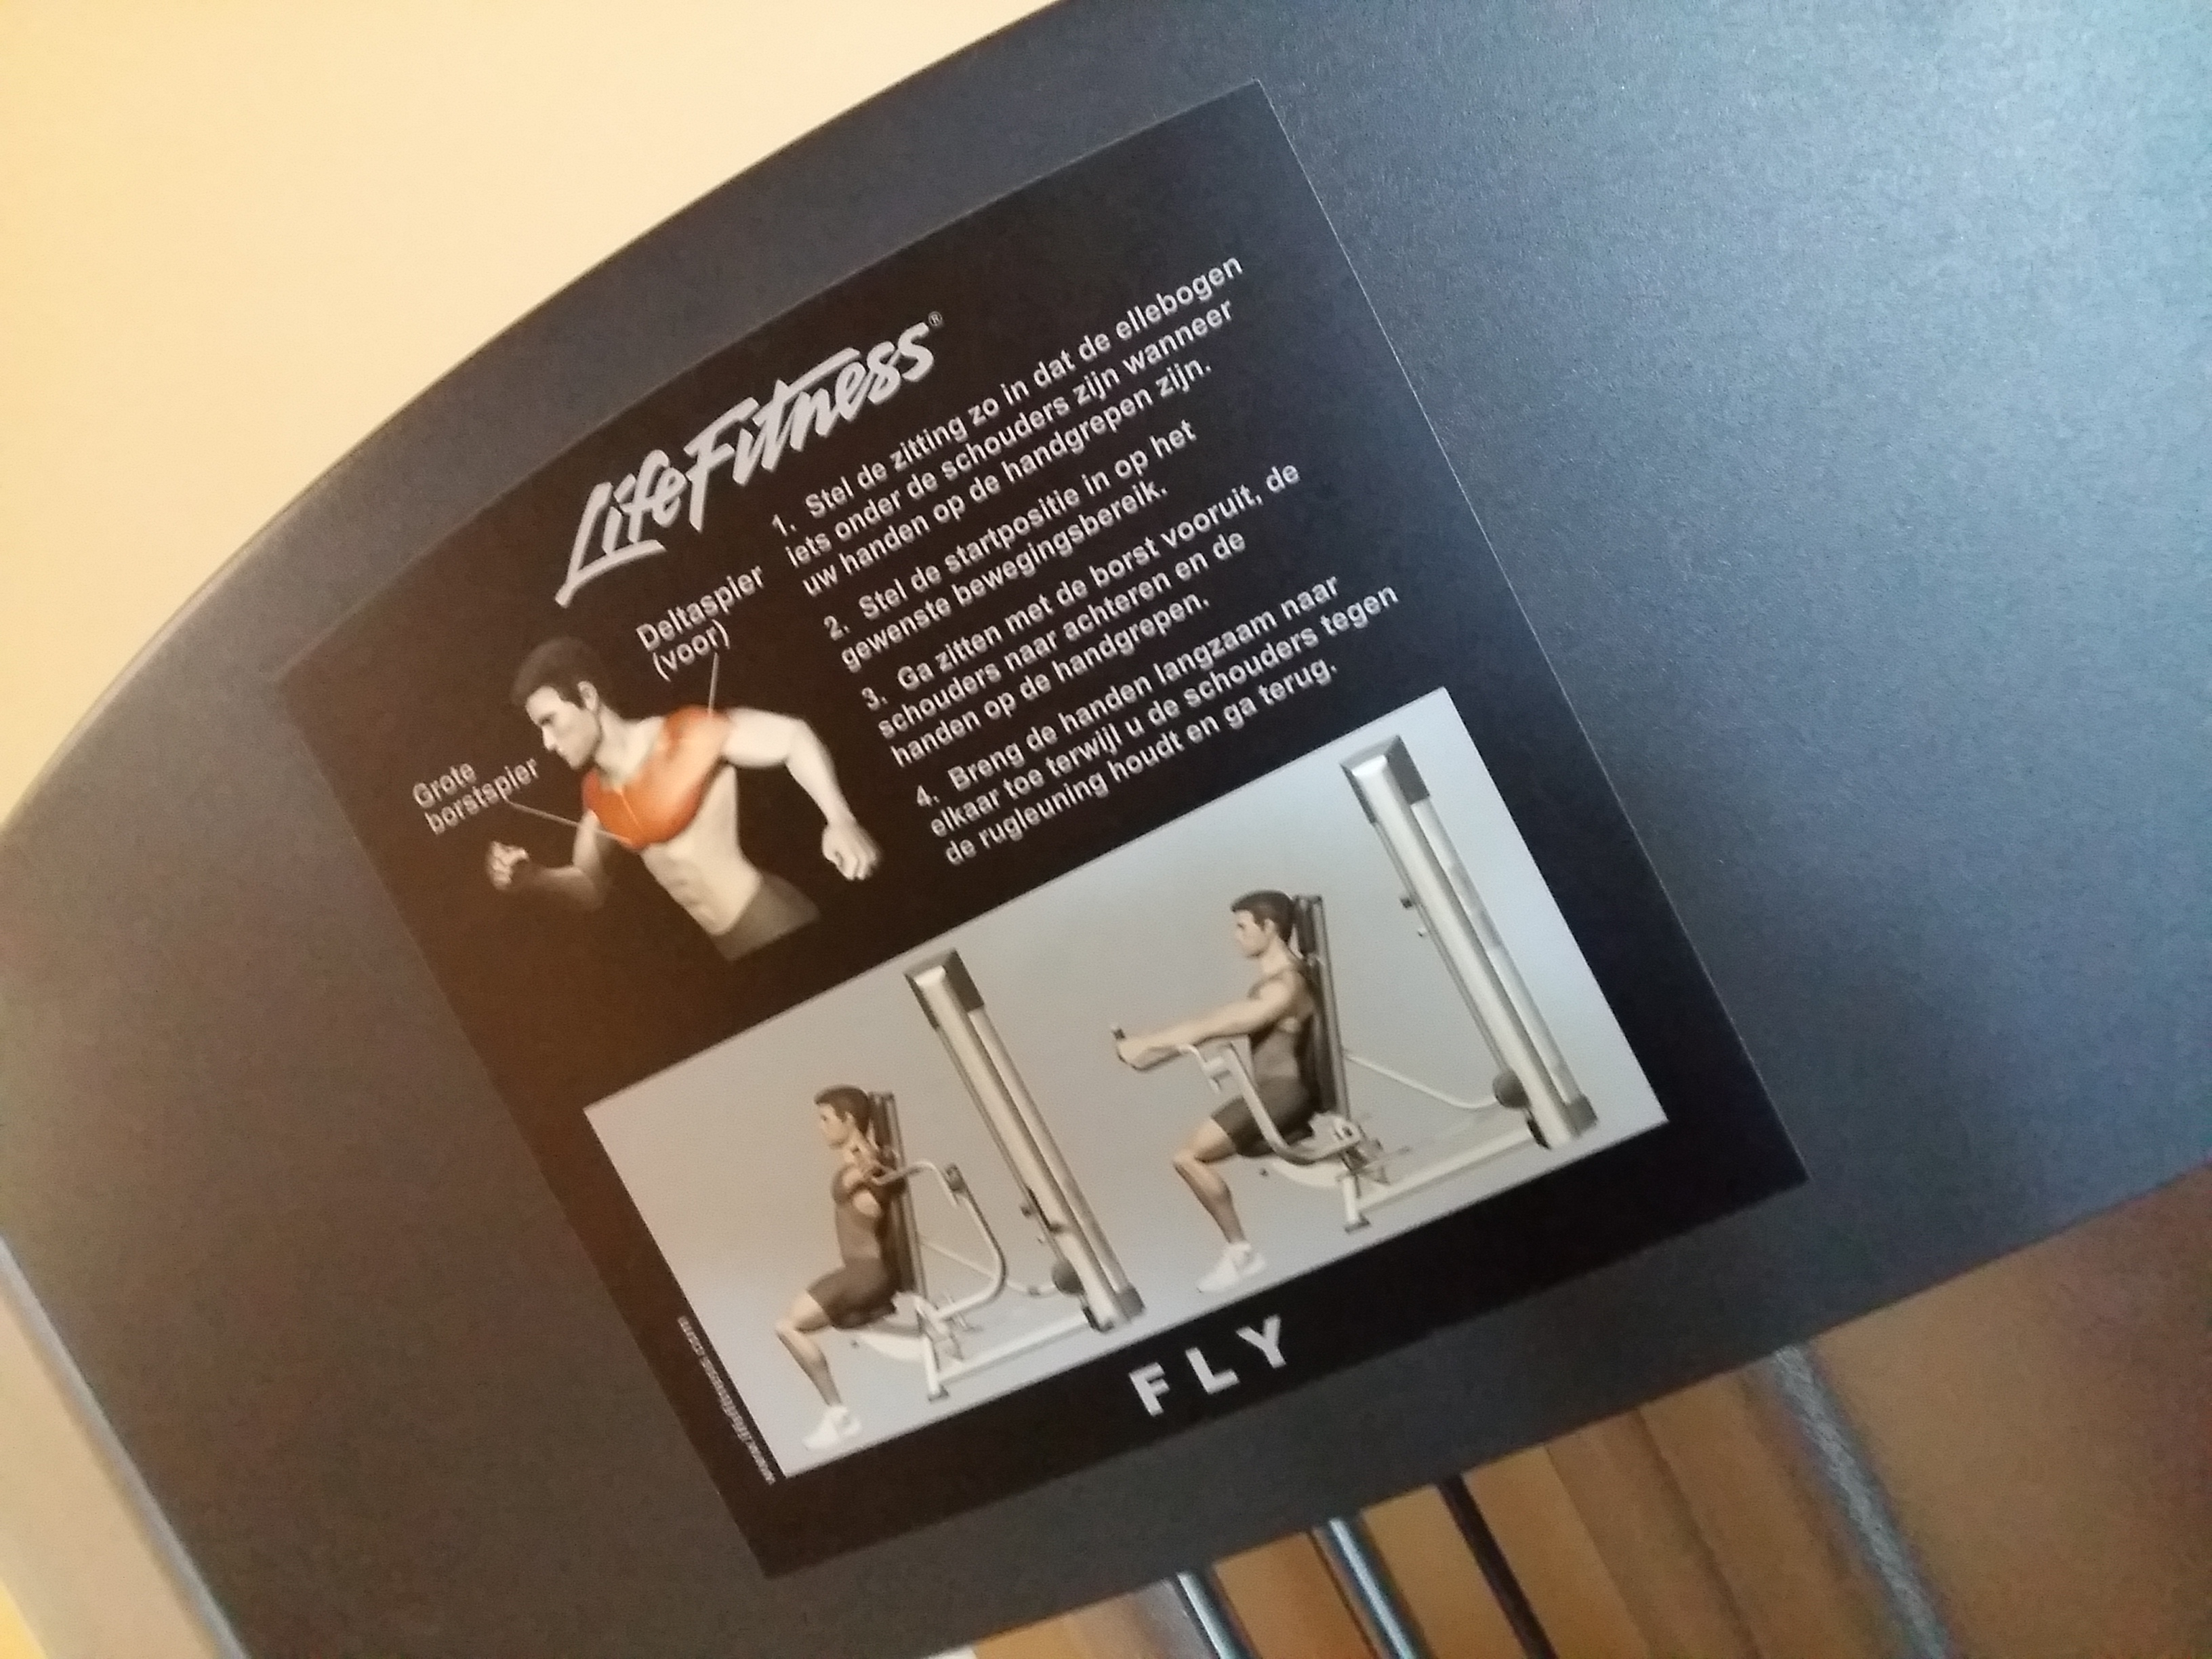 Fitness Klub Active Fit Pleszew ul. Traugutta 30 trening personalny siłownia 5